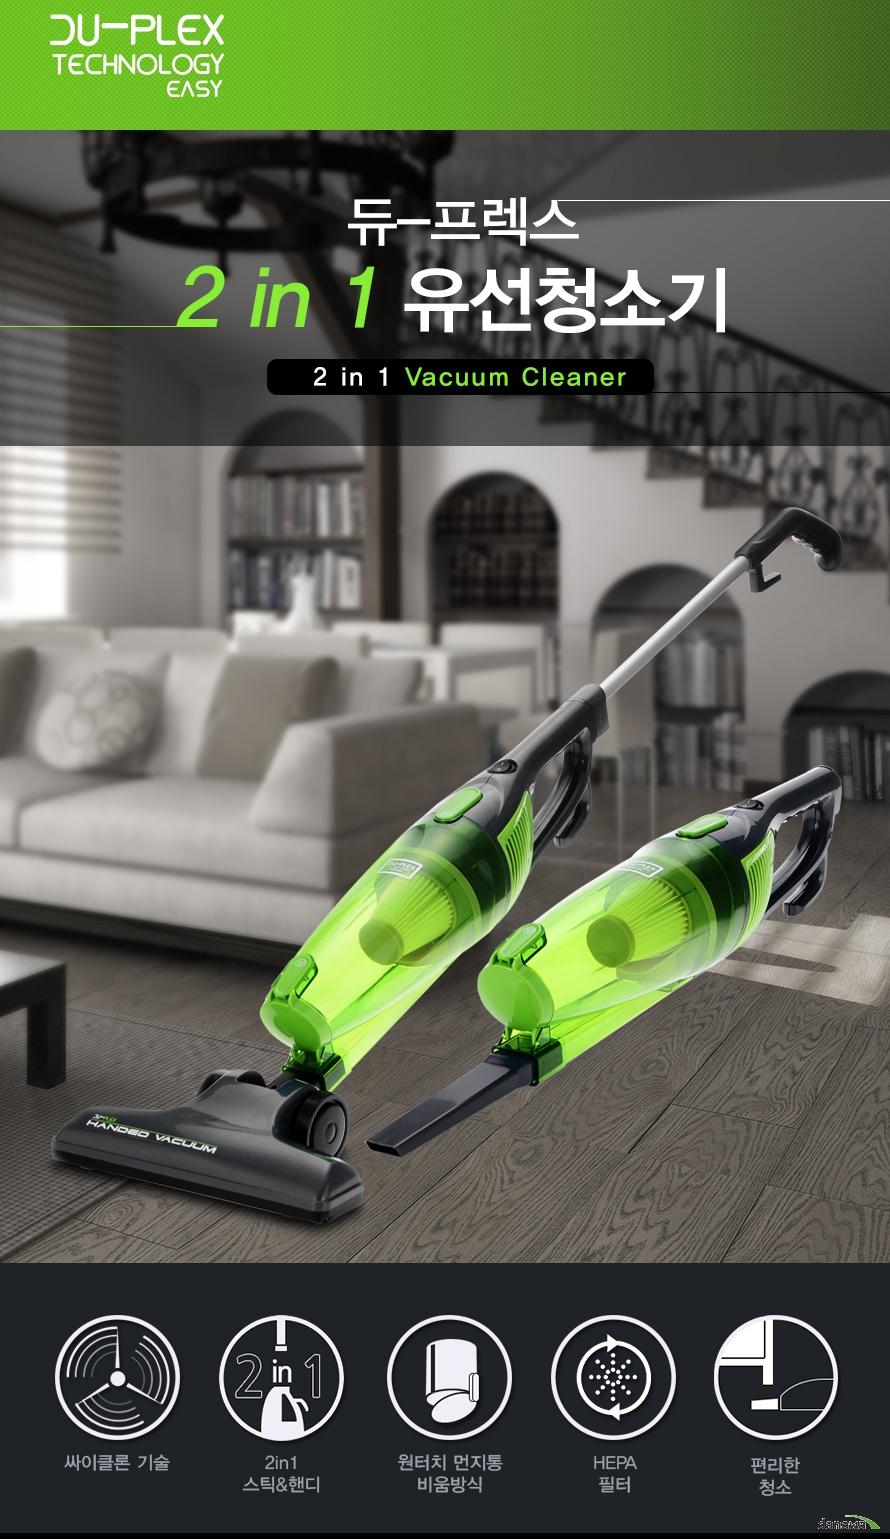 Du-PLEX TECHNOLOGY EASY 듀프렉스 2in1 유선청소기 2in1 Vacuum Cleaner